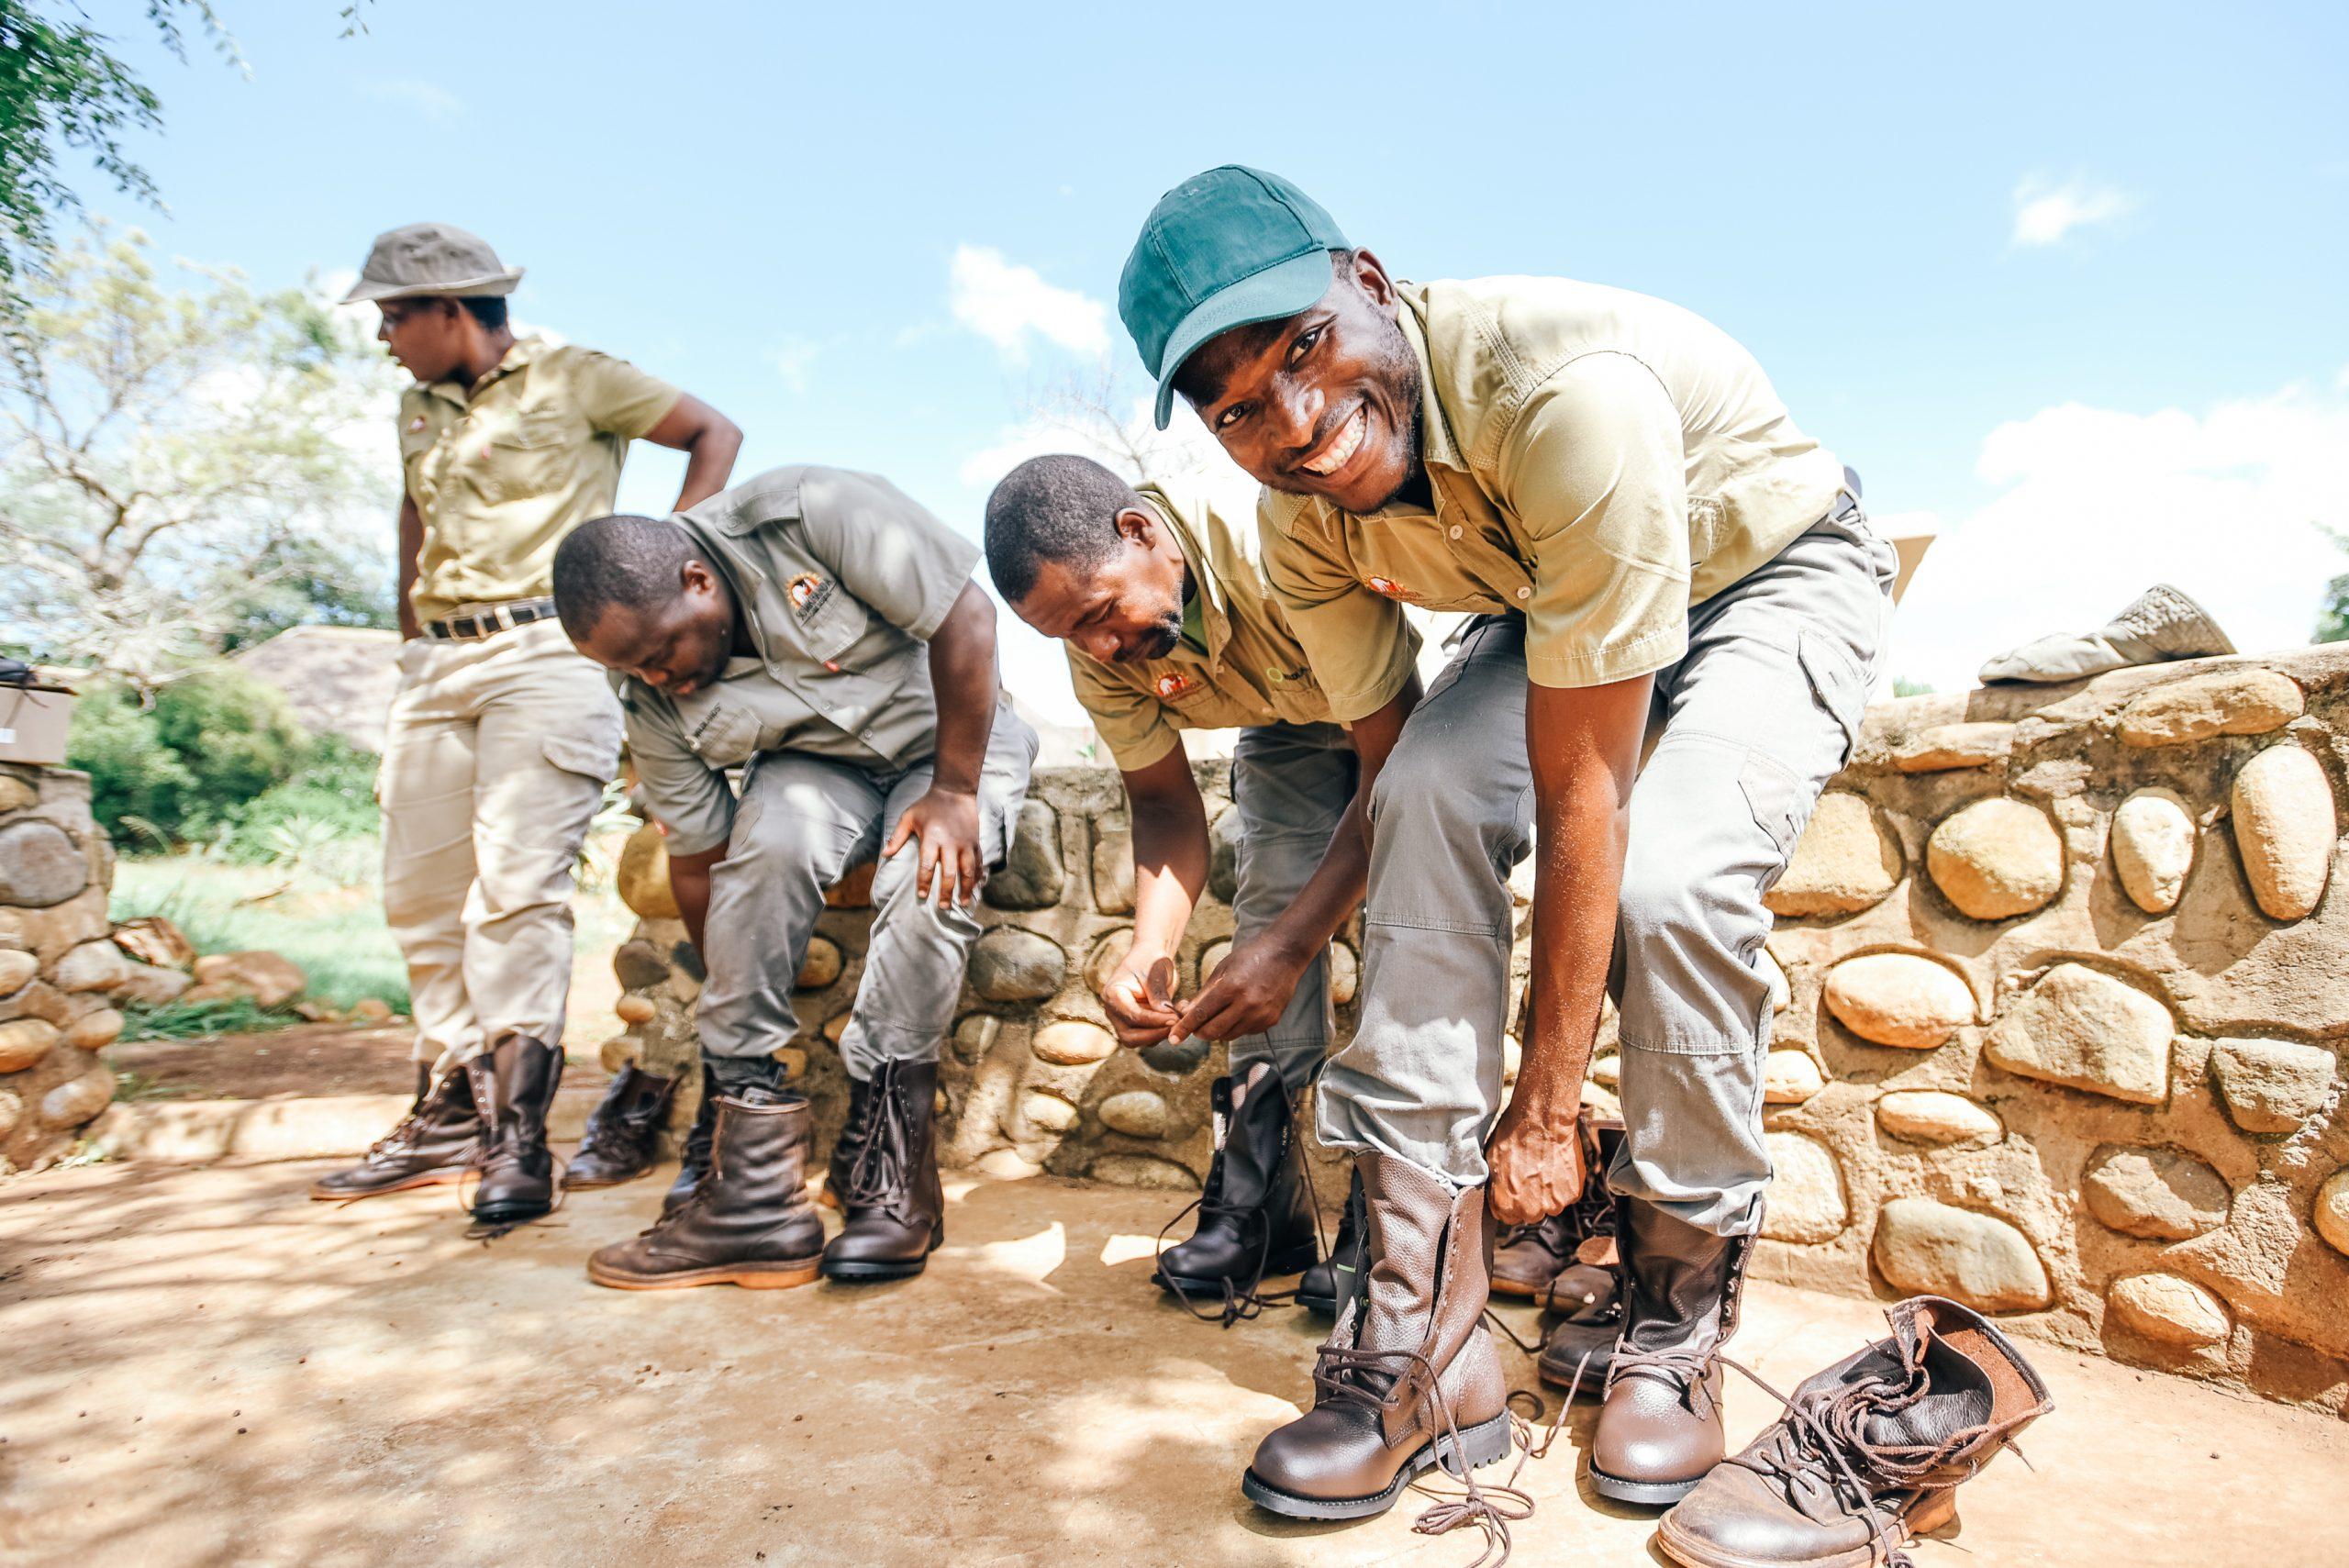 Zululand Monitoring Team – ACT Fund Trust